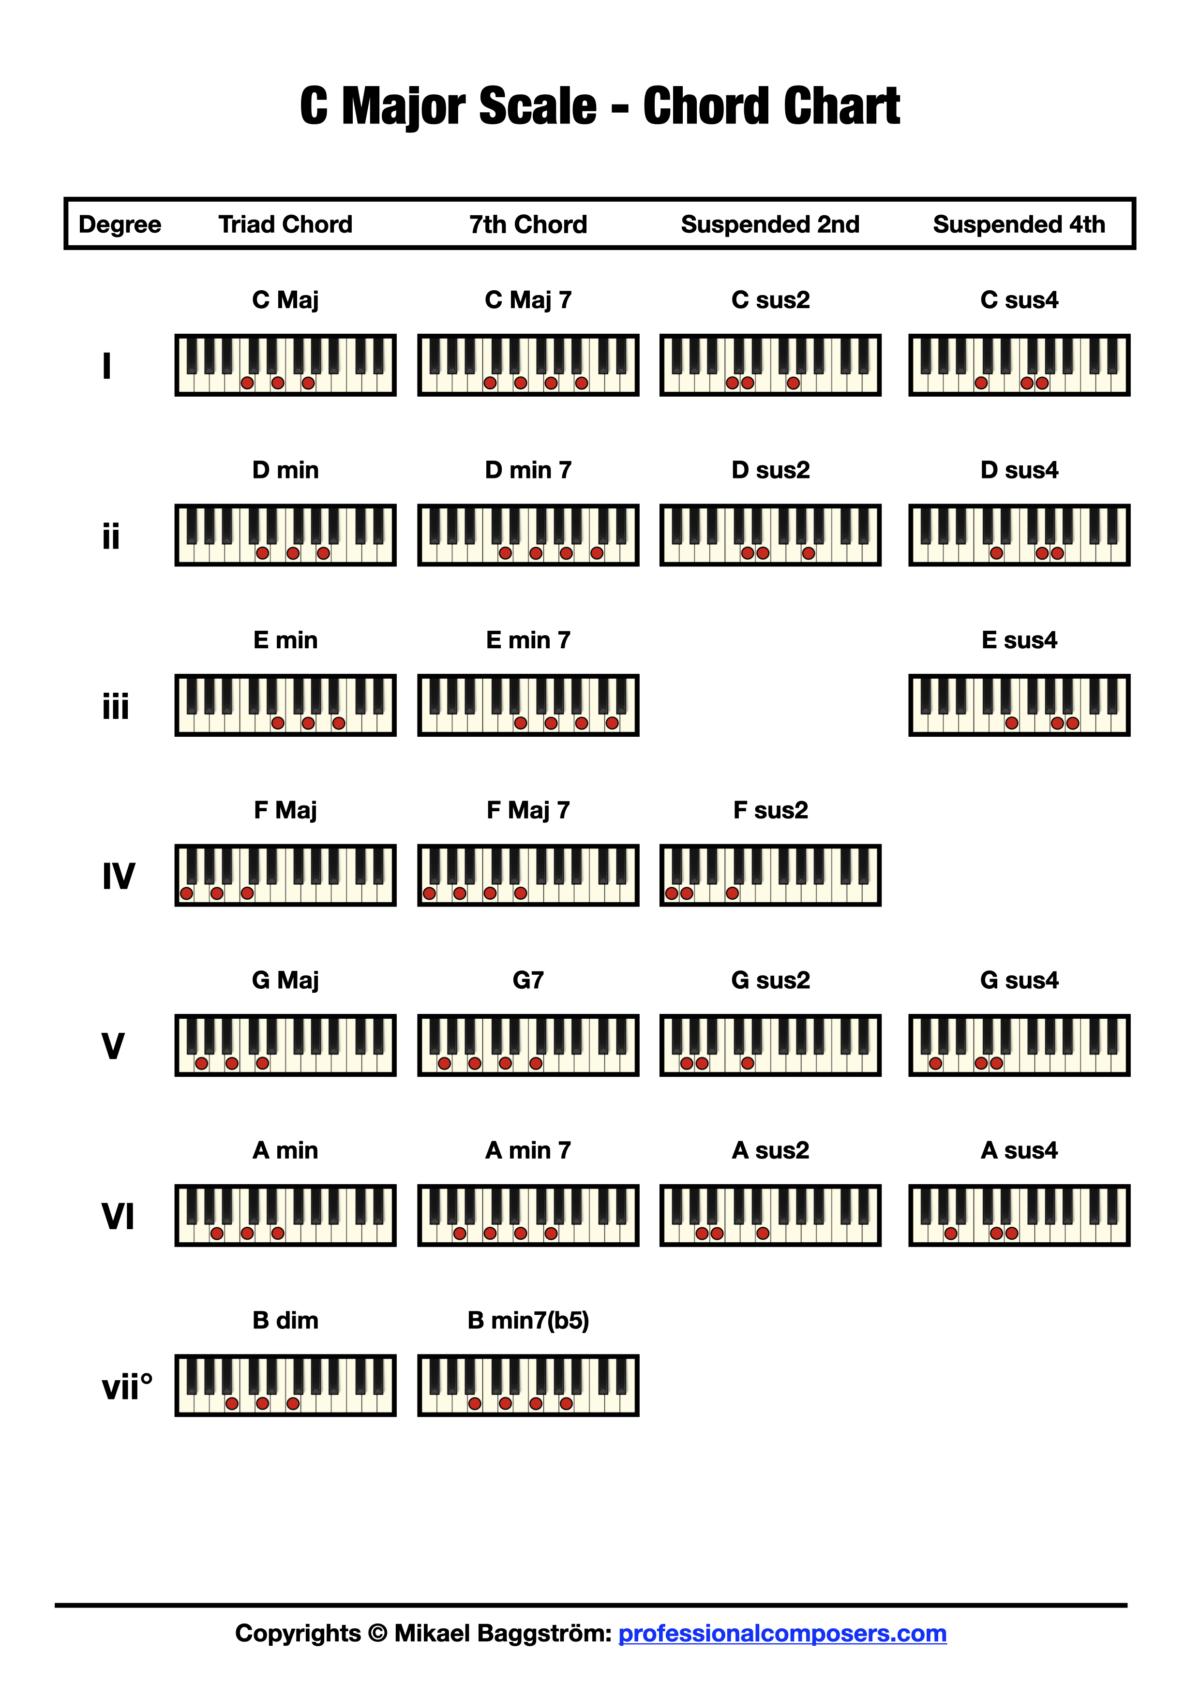 Chord Chart - C Major Scale